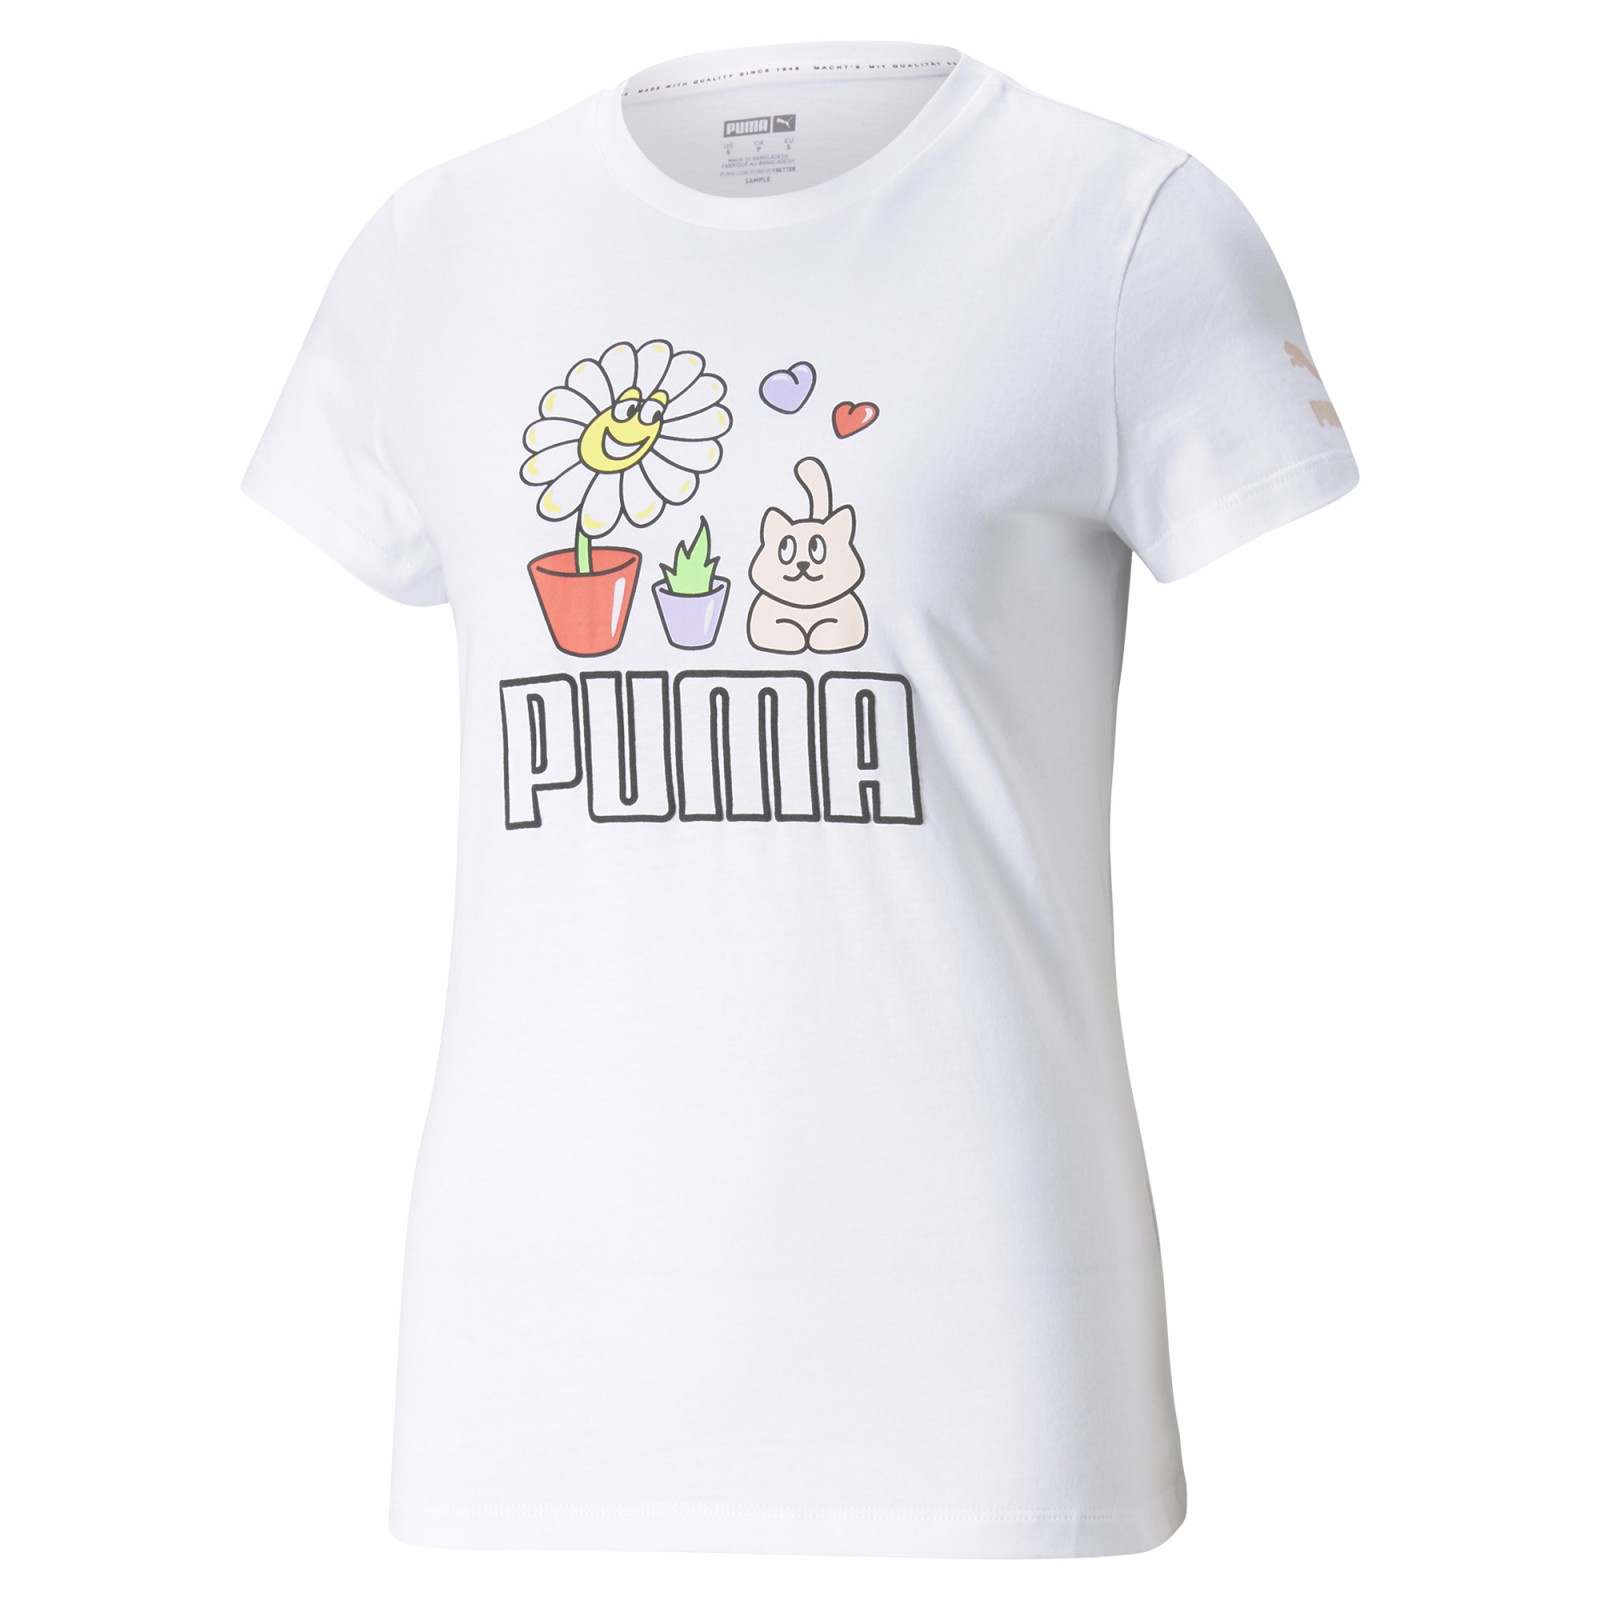 Graphic Tee Summer Streetwear Puma White Puma White